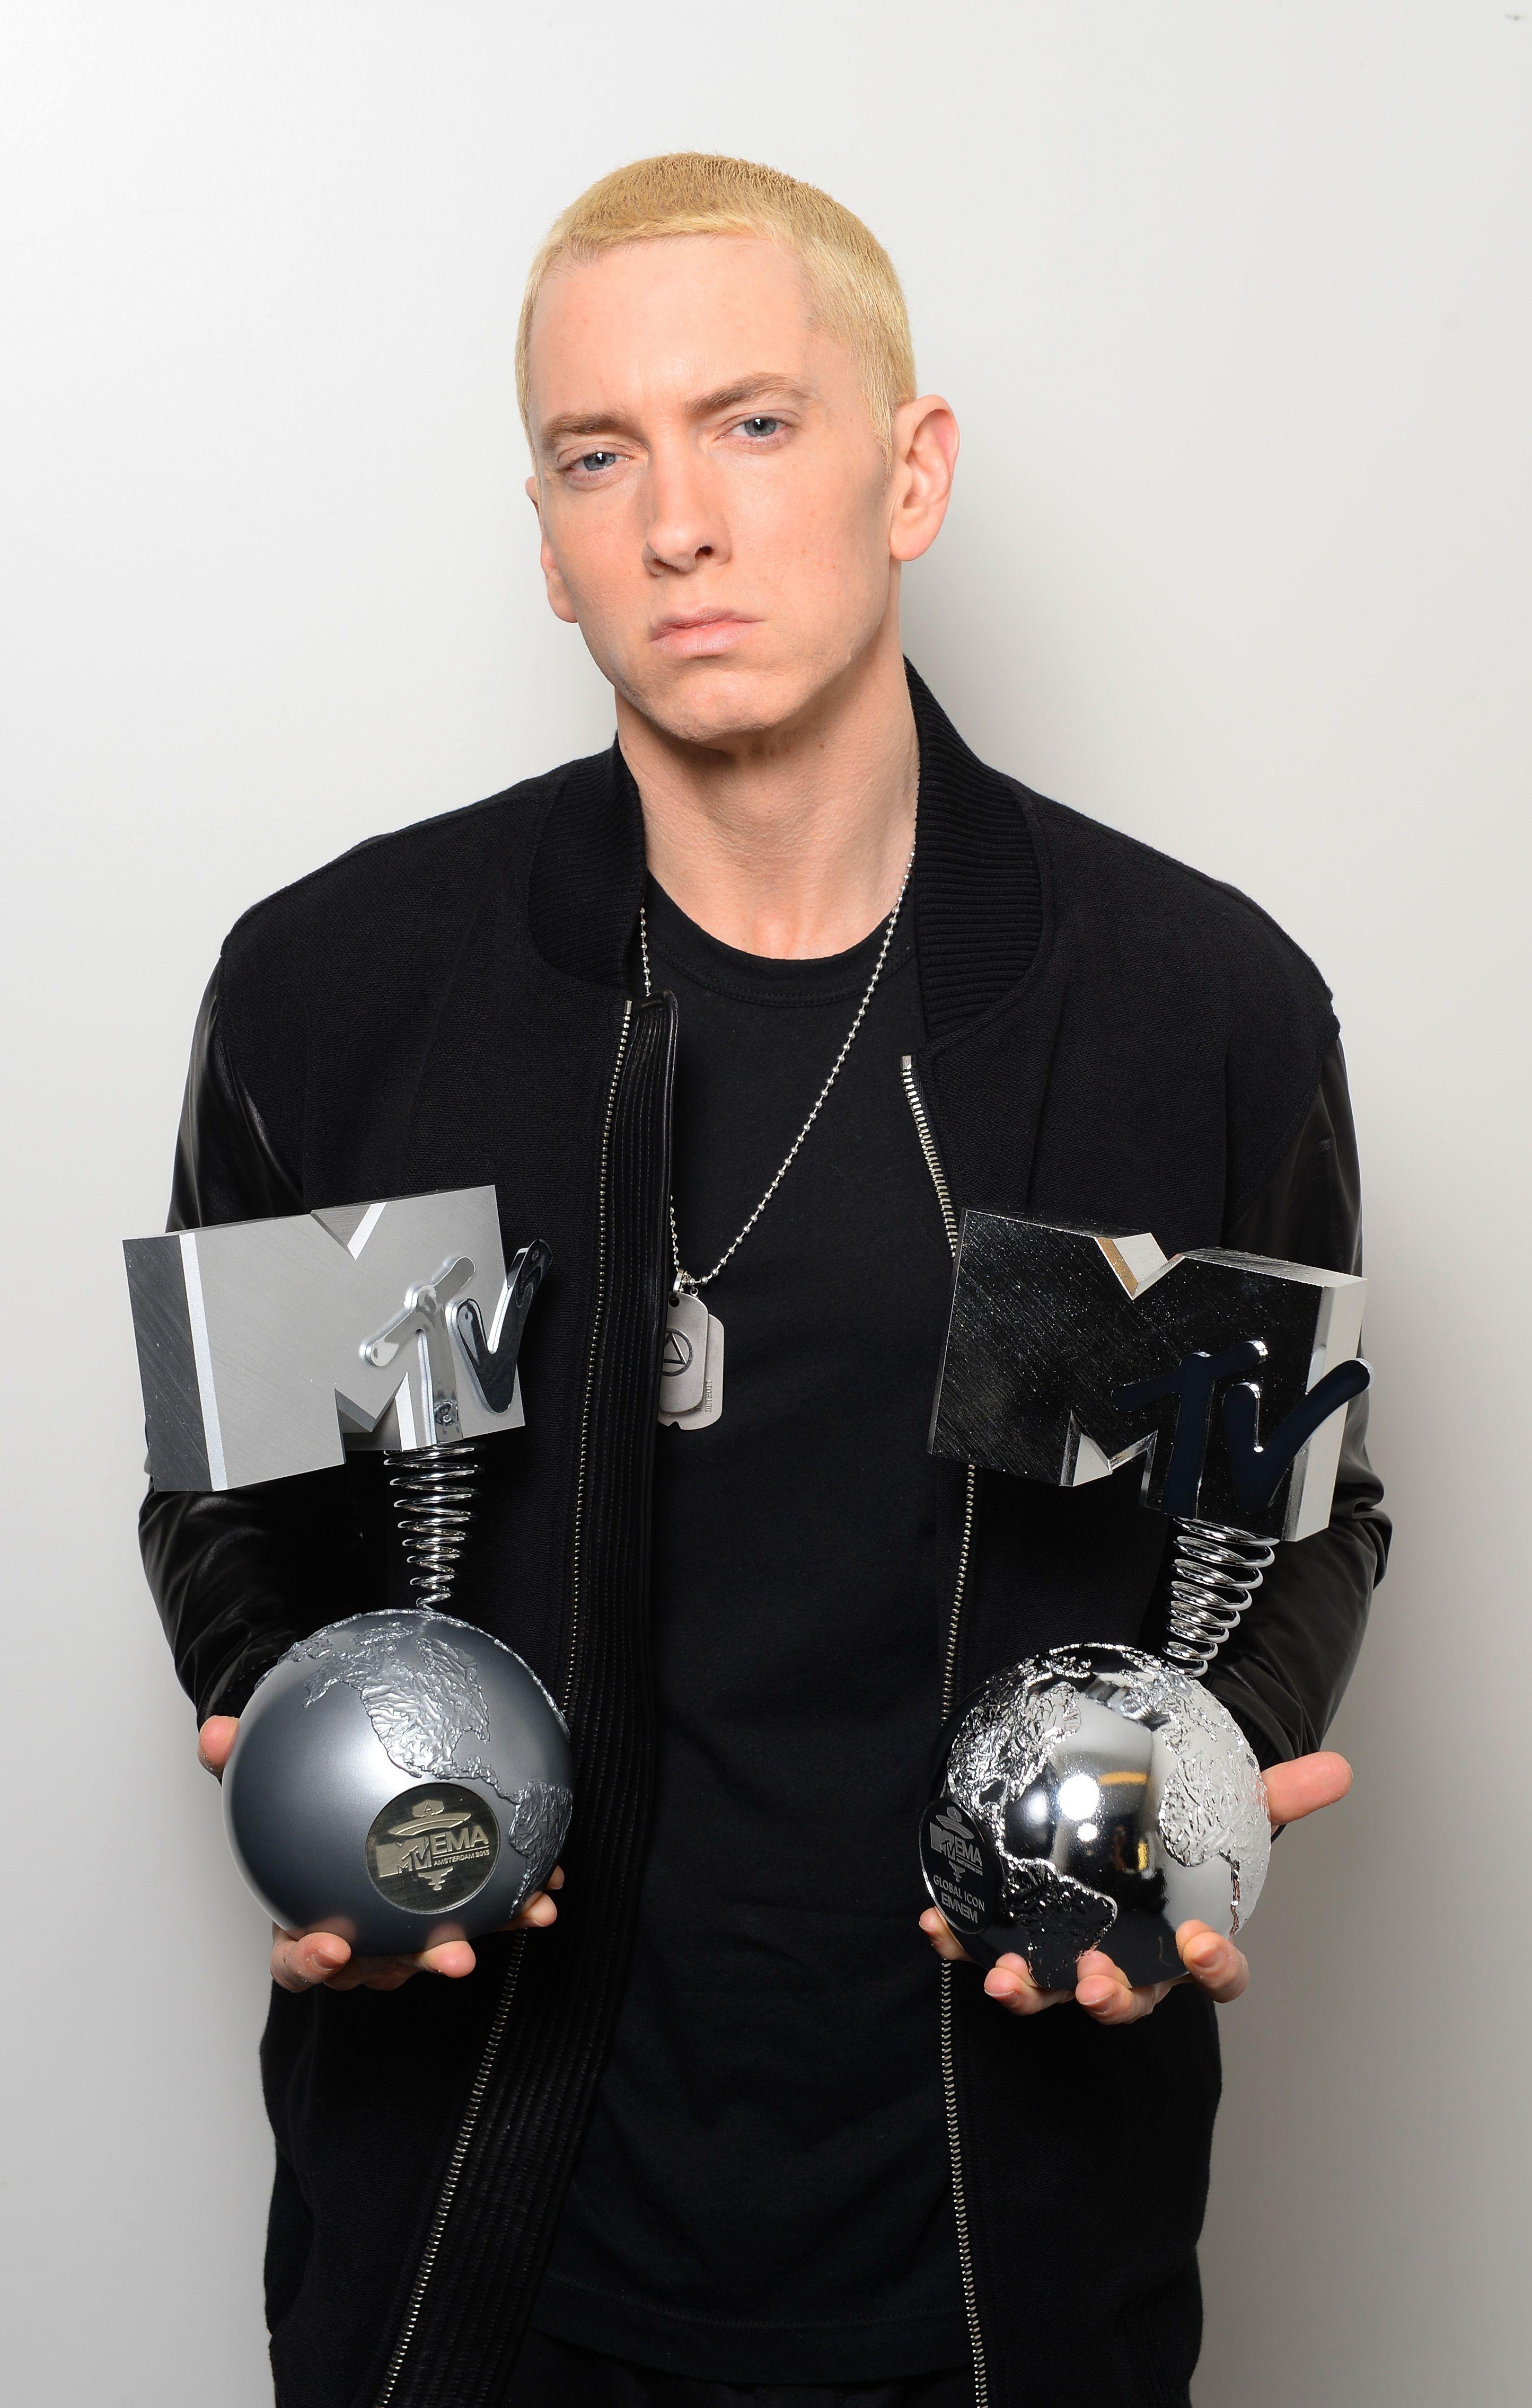 Eminem-s-Rep-Addresses-His-Leaked-Lyric-Siding-With-Chris-Brown-Over-Rihanna-Assault